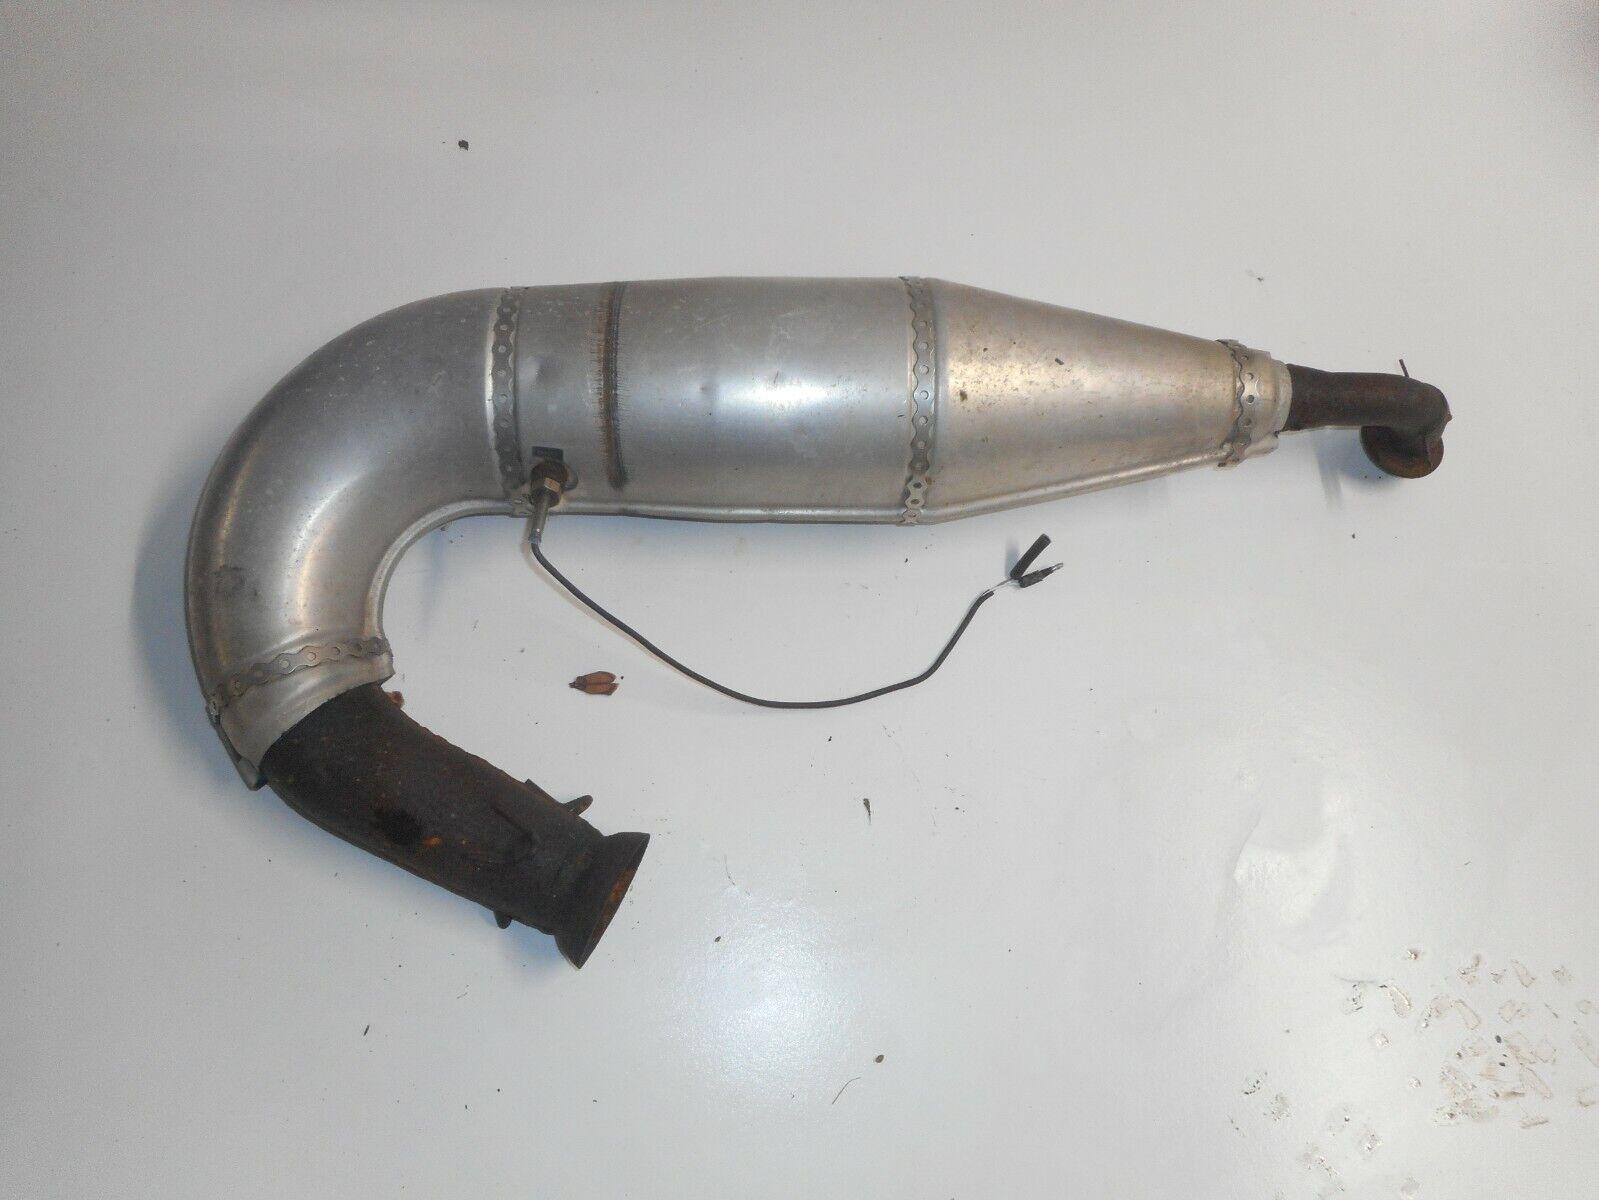 02 Arctic Cat ZR, ZL 500 Exhaust Pipe,  Part no 0712-823